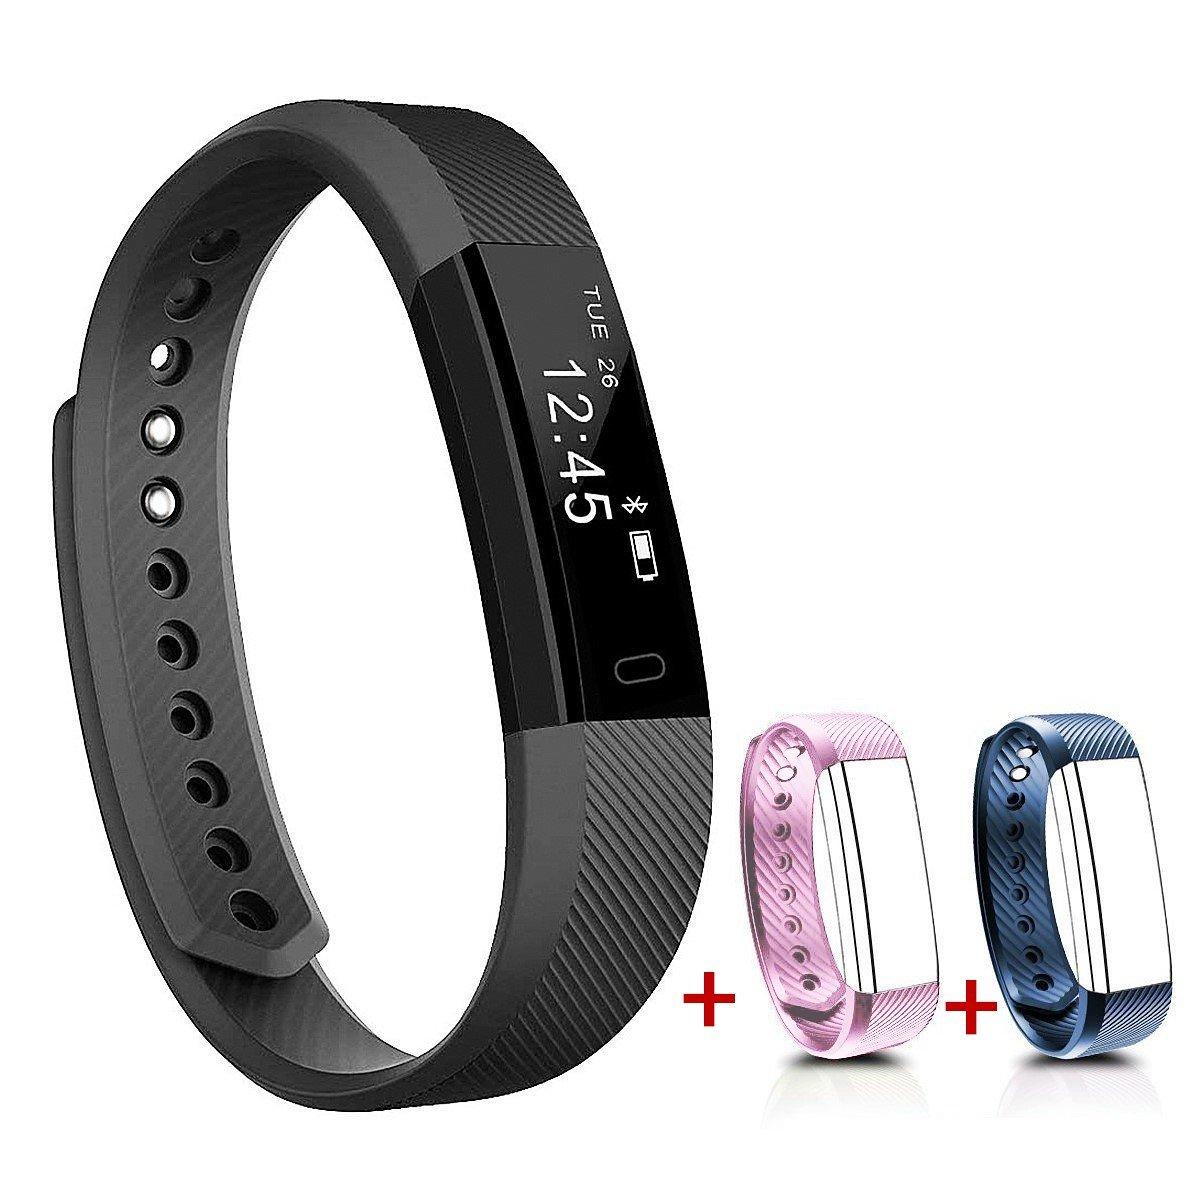 NAKOSITE SB2433 Reloj inteligente mujer hombre Smartwatch Pulsera actividad relojes Inteligentes deportivo, Podometro… 1